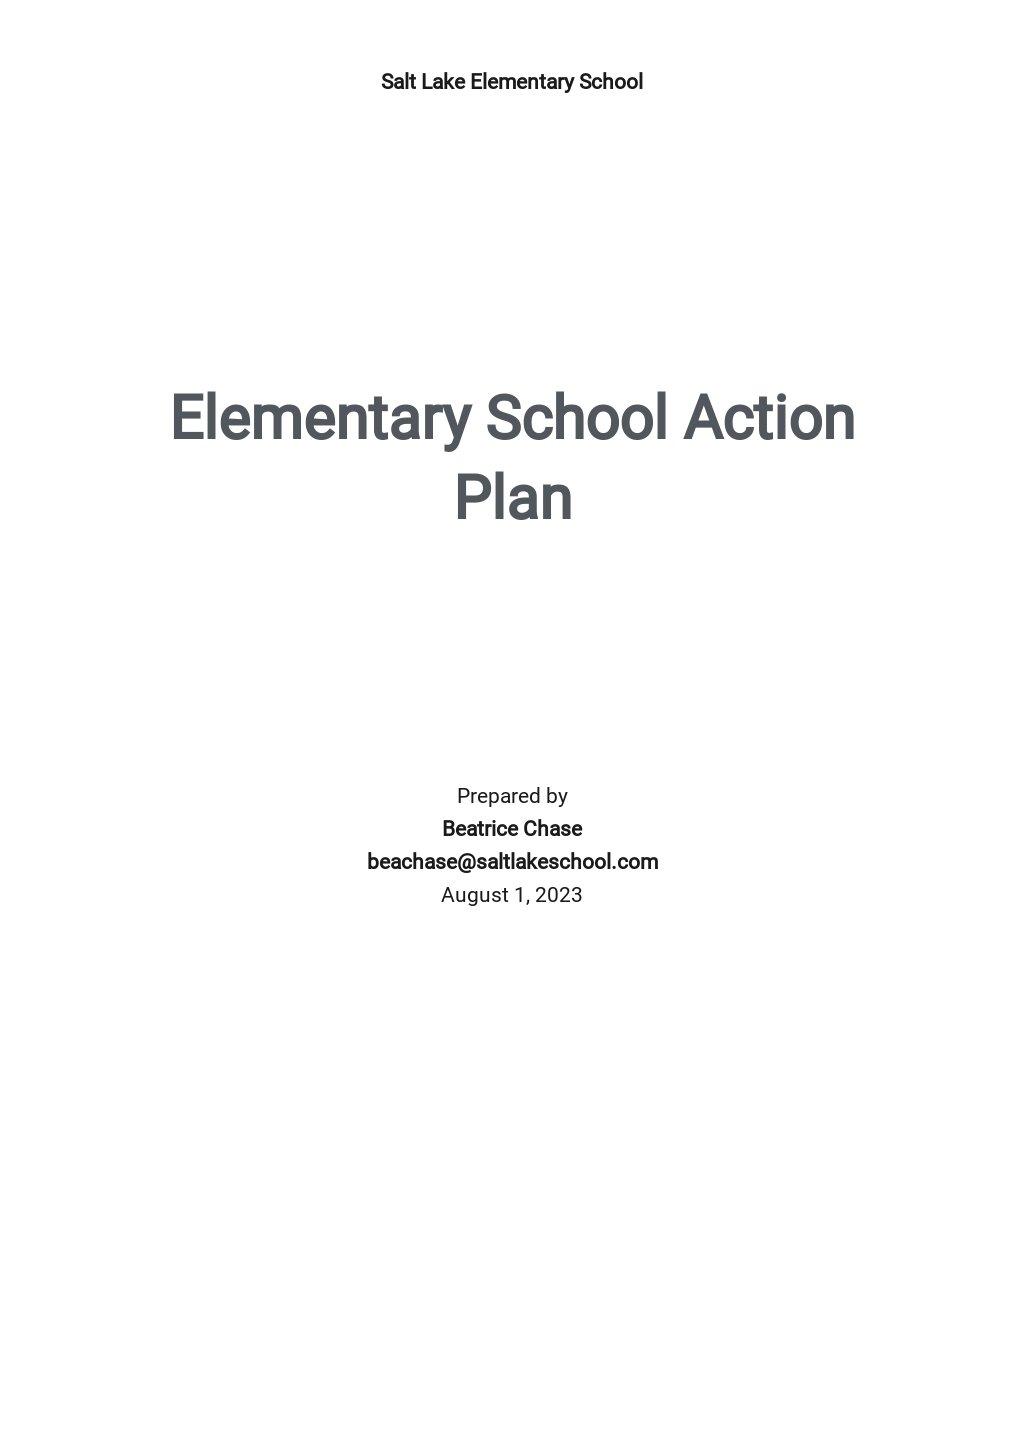 Elementary School Action Plan Template